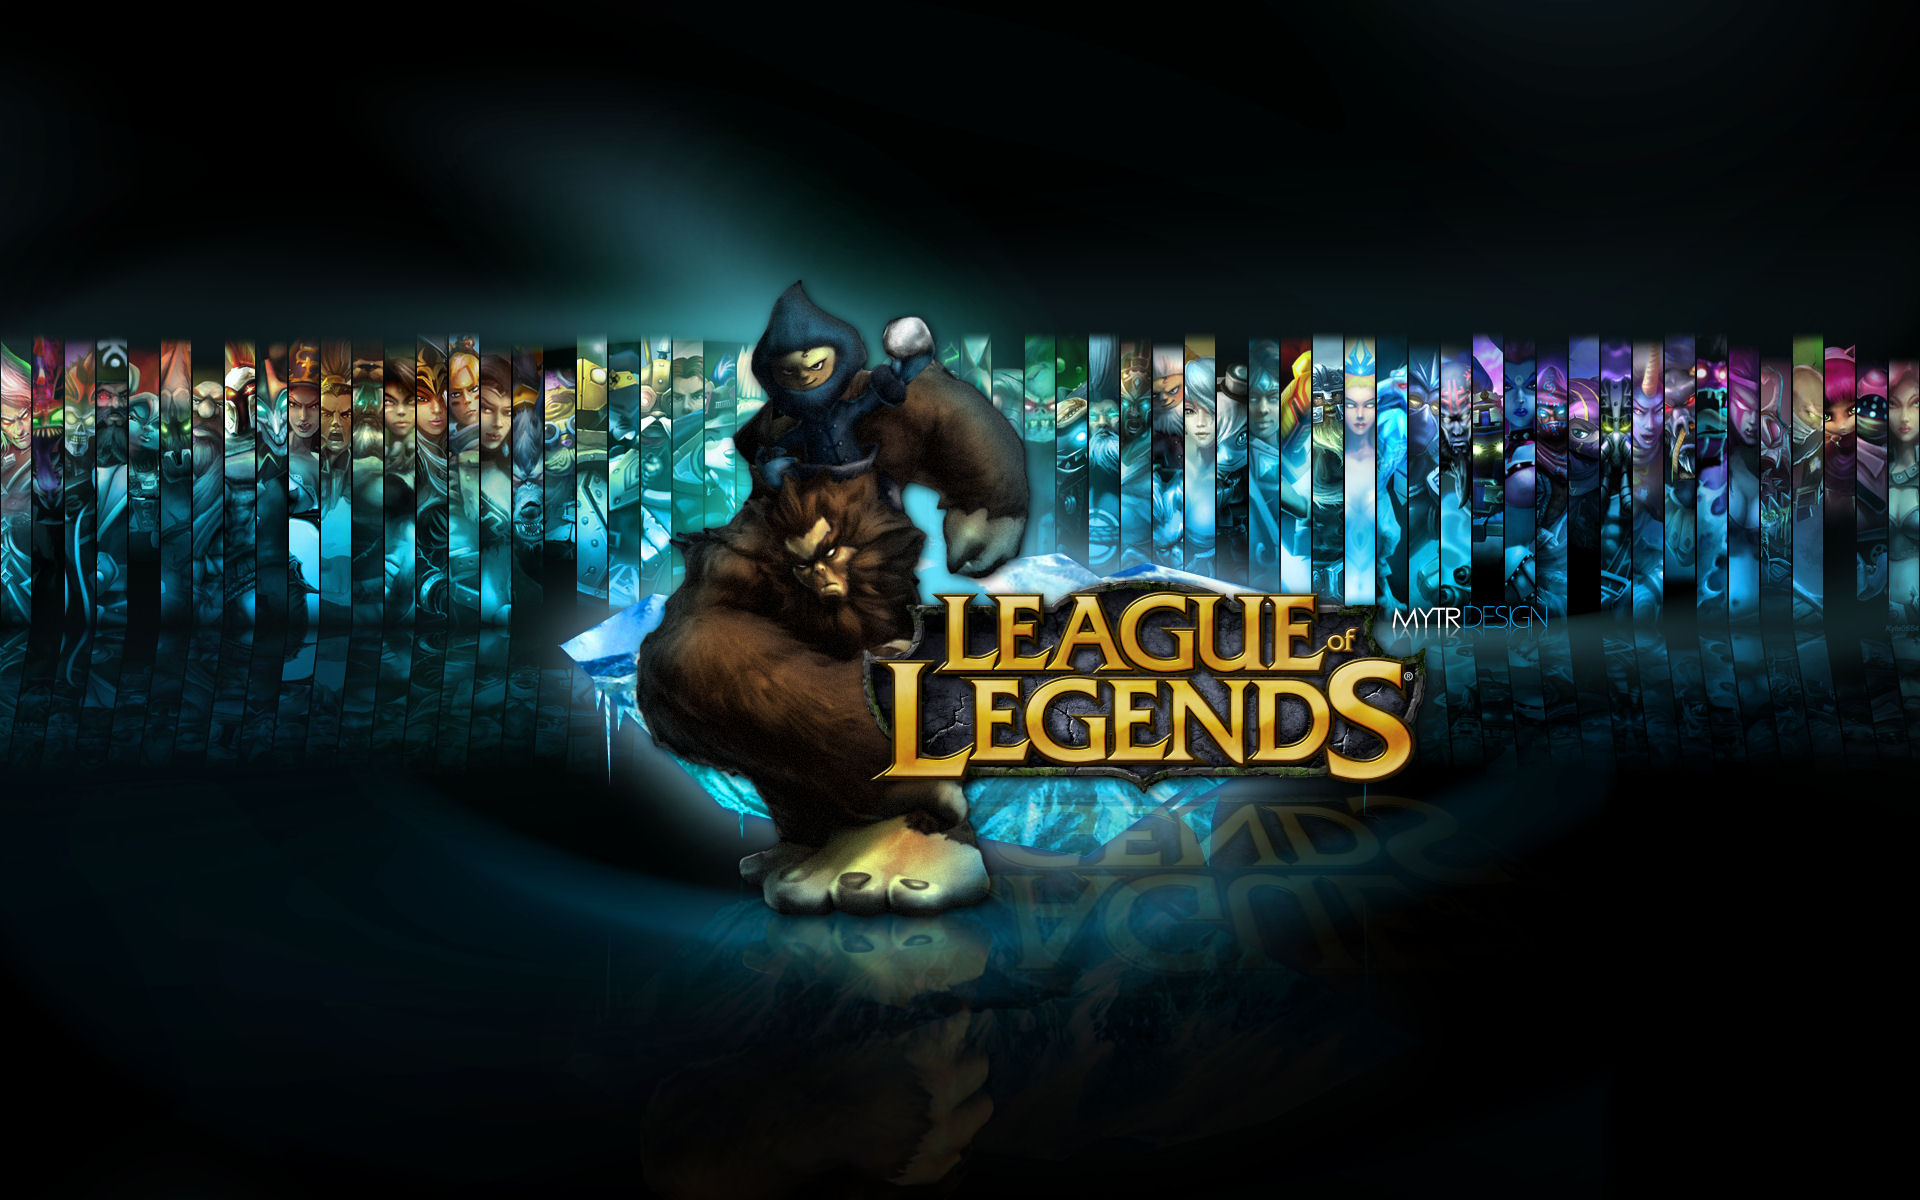 League Of Legends Desktop Background | Wallpapers9